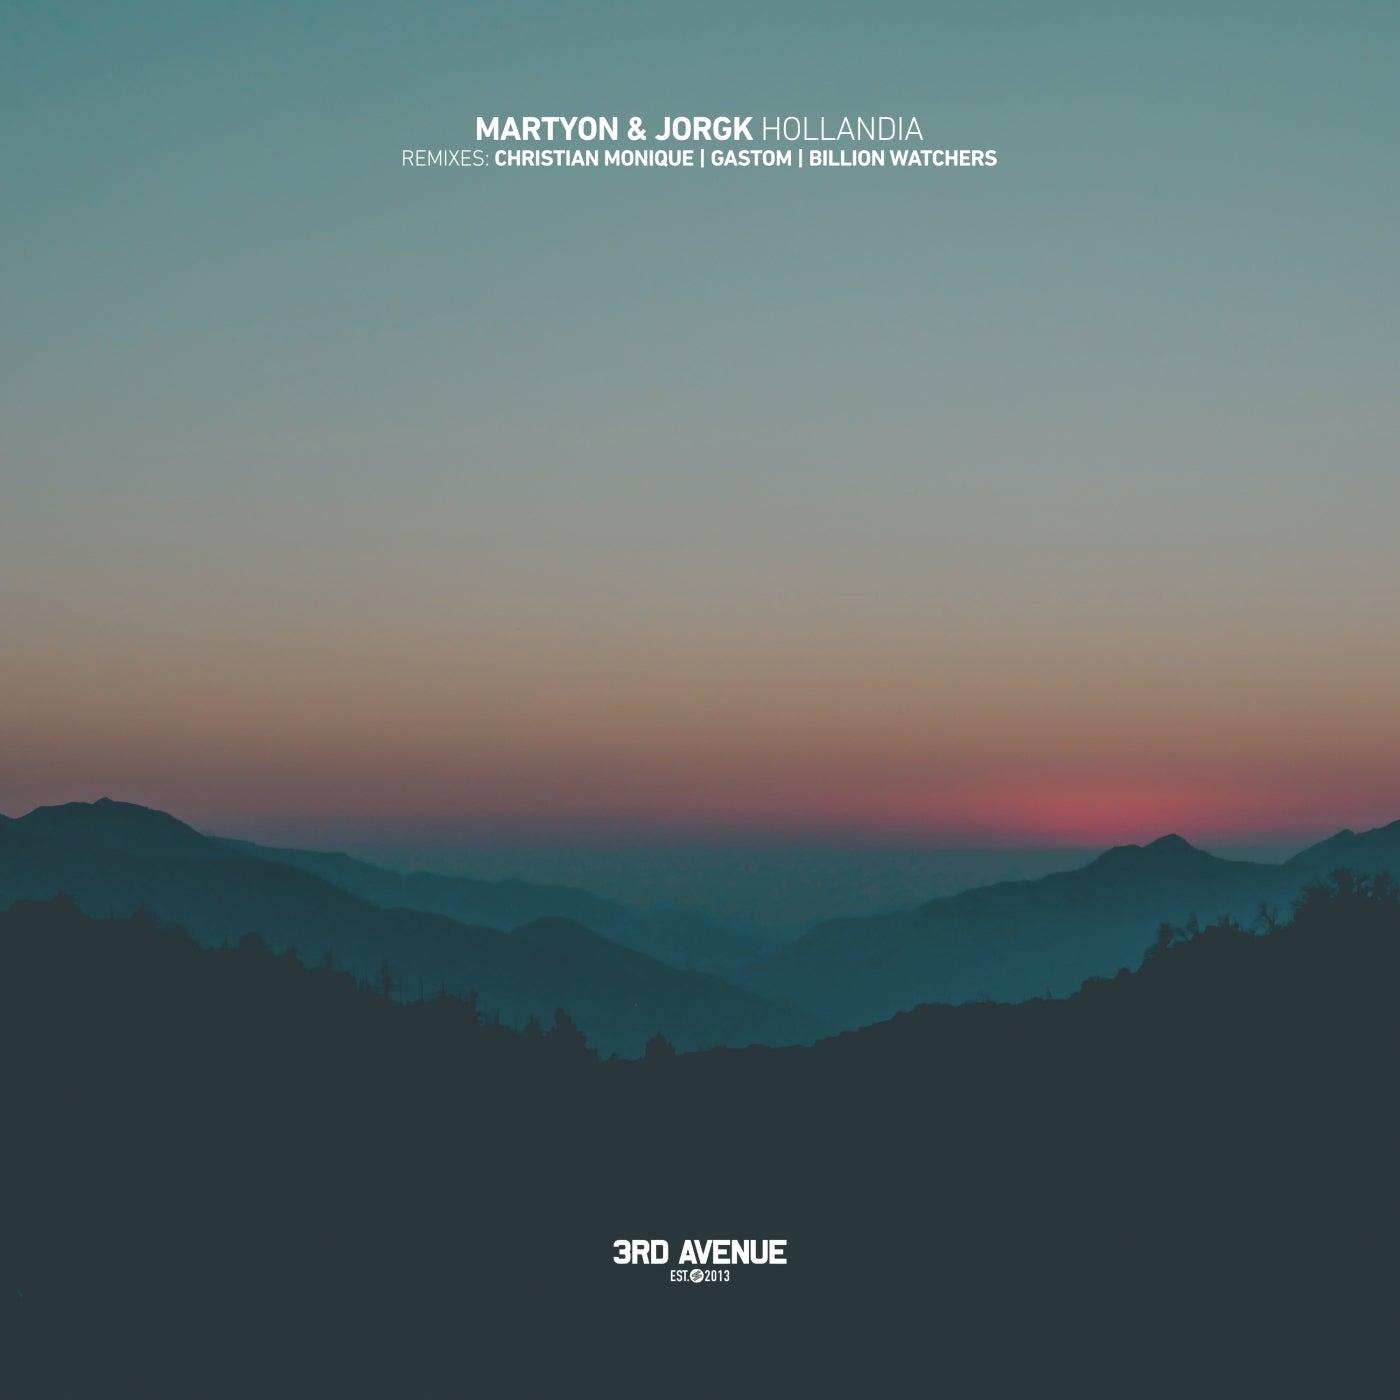 Hollandia (GastoM Remix)